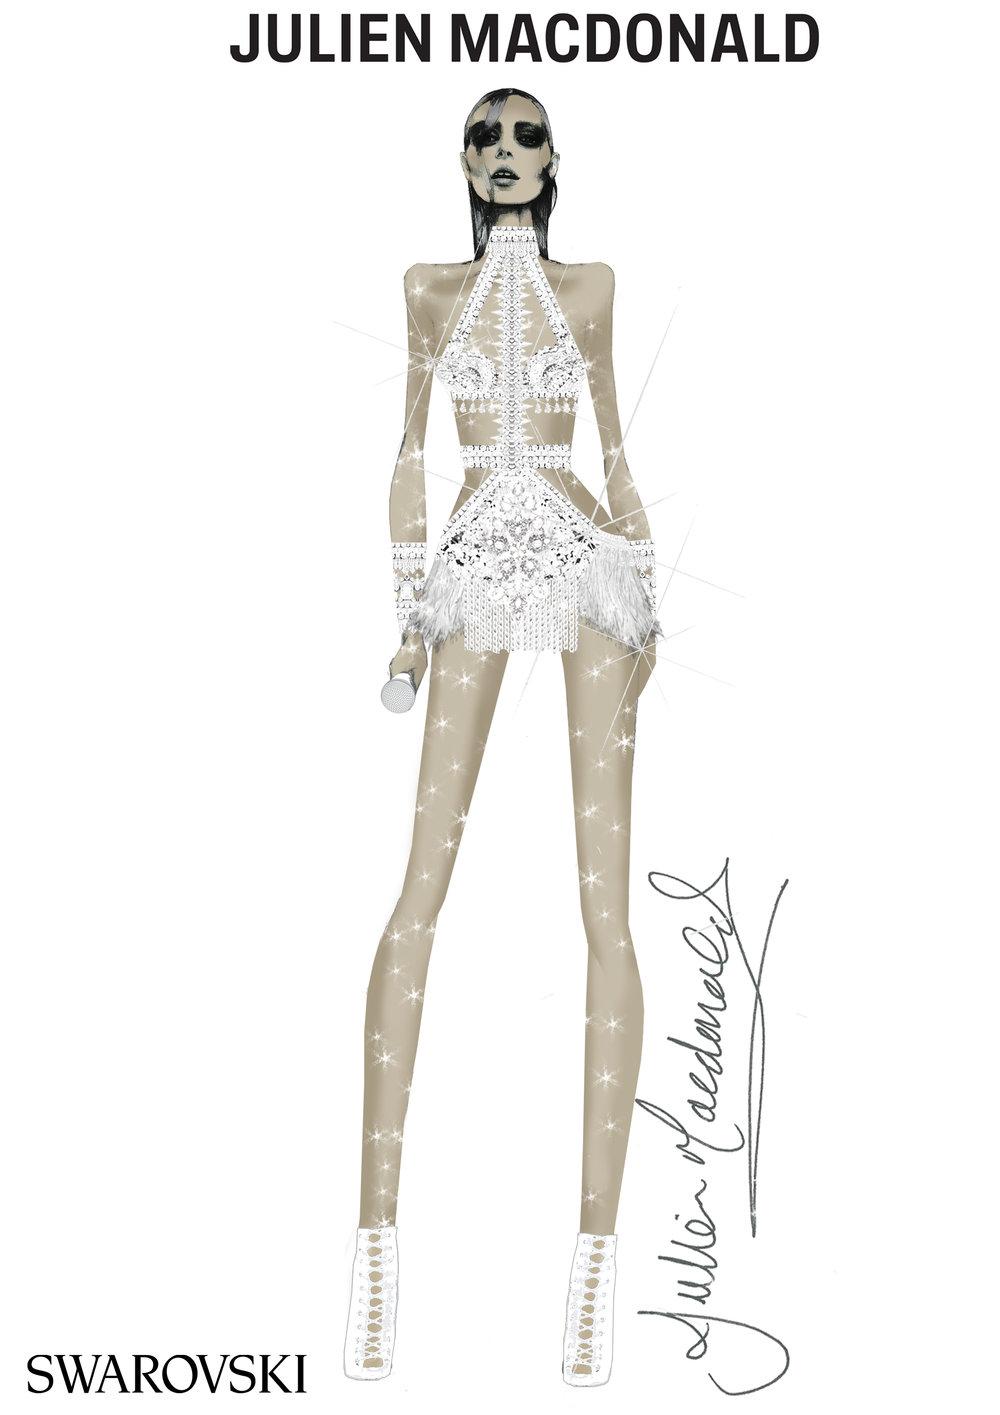 Sketch by Julie Macdonald for Jennifer Lopez's 'All I Have' Las Vegas Residency, 2017 (1).jpg